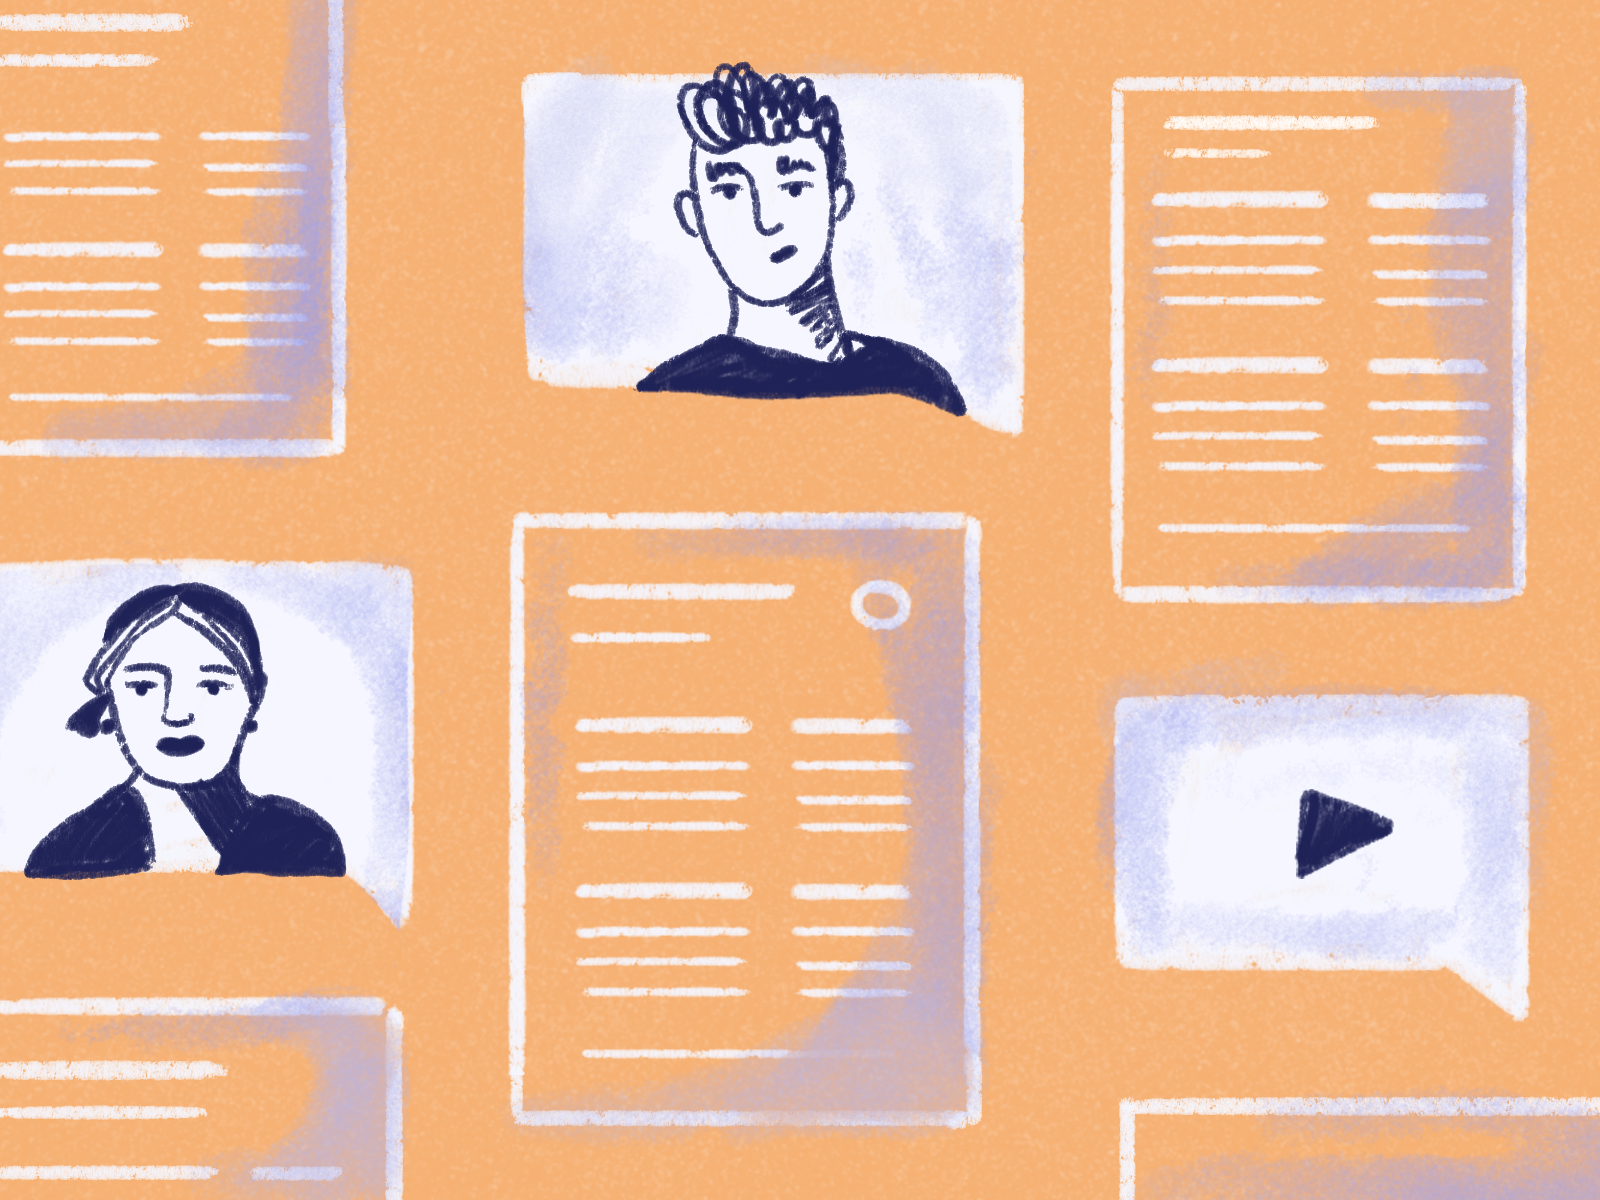 Video resume dribbble 4x